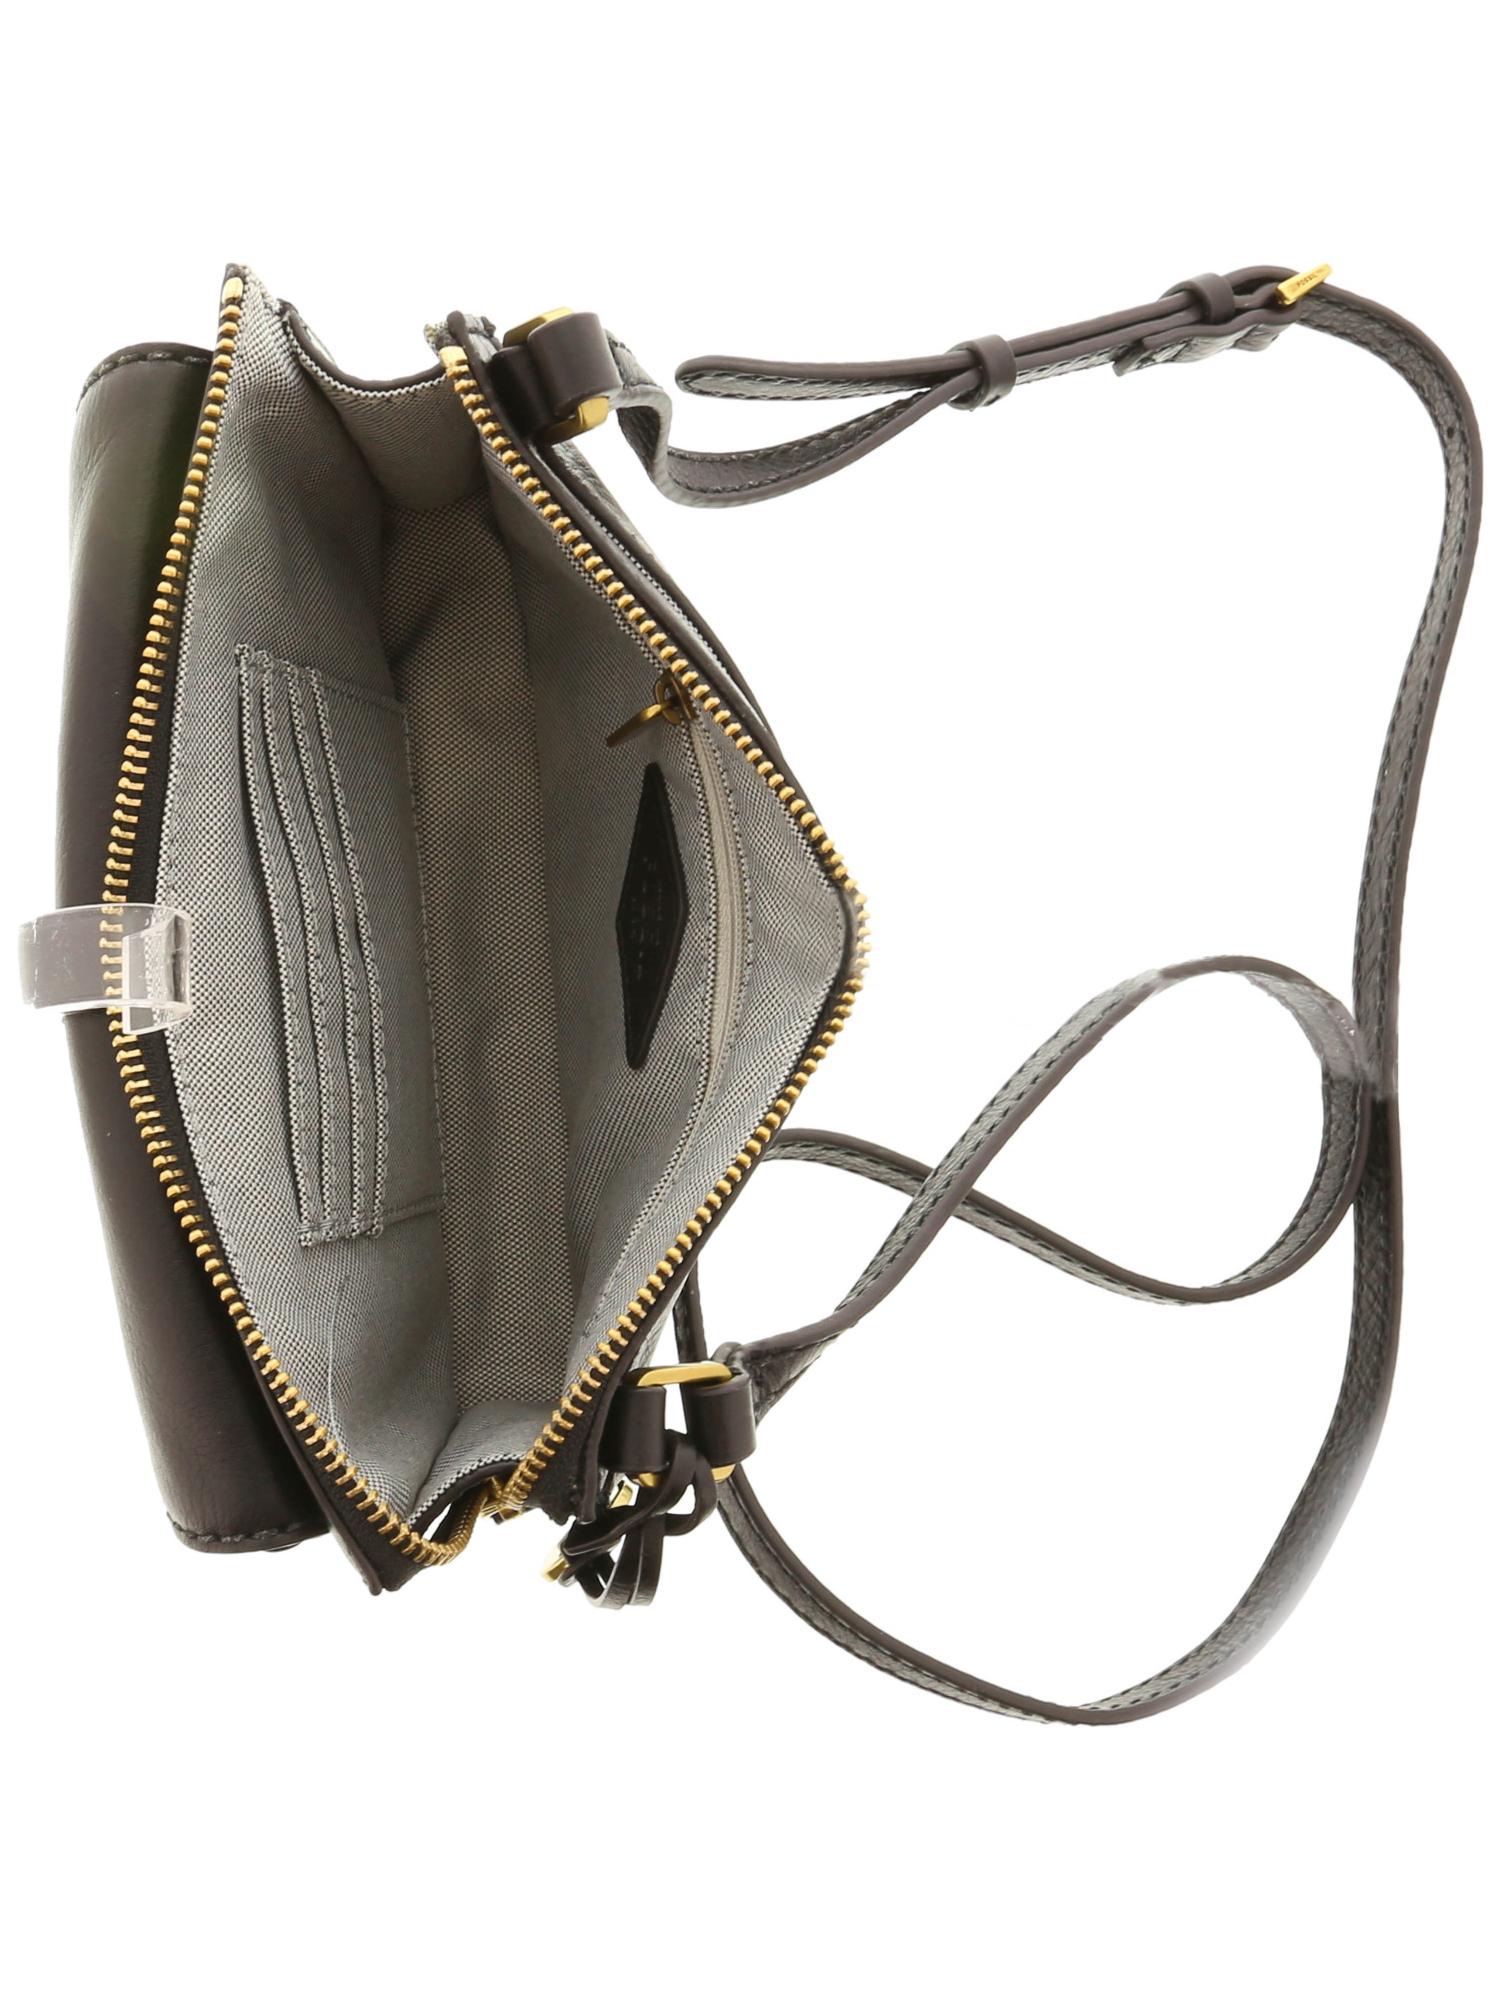 a854250683 Fossil Women s Ryder Crossbody Leather Cross Body Bag